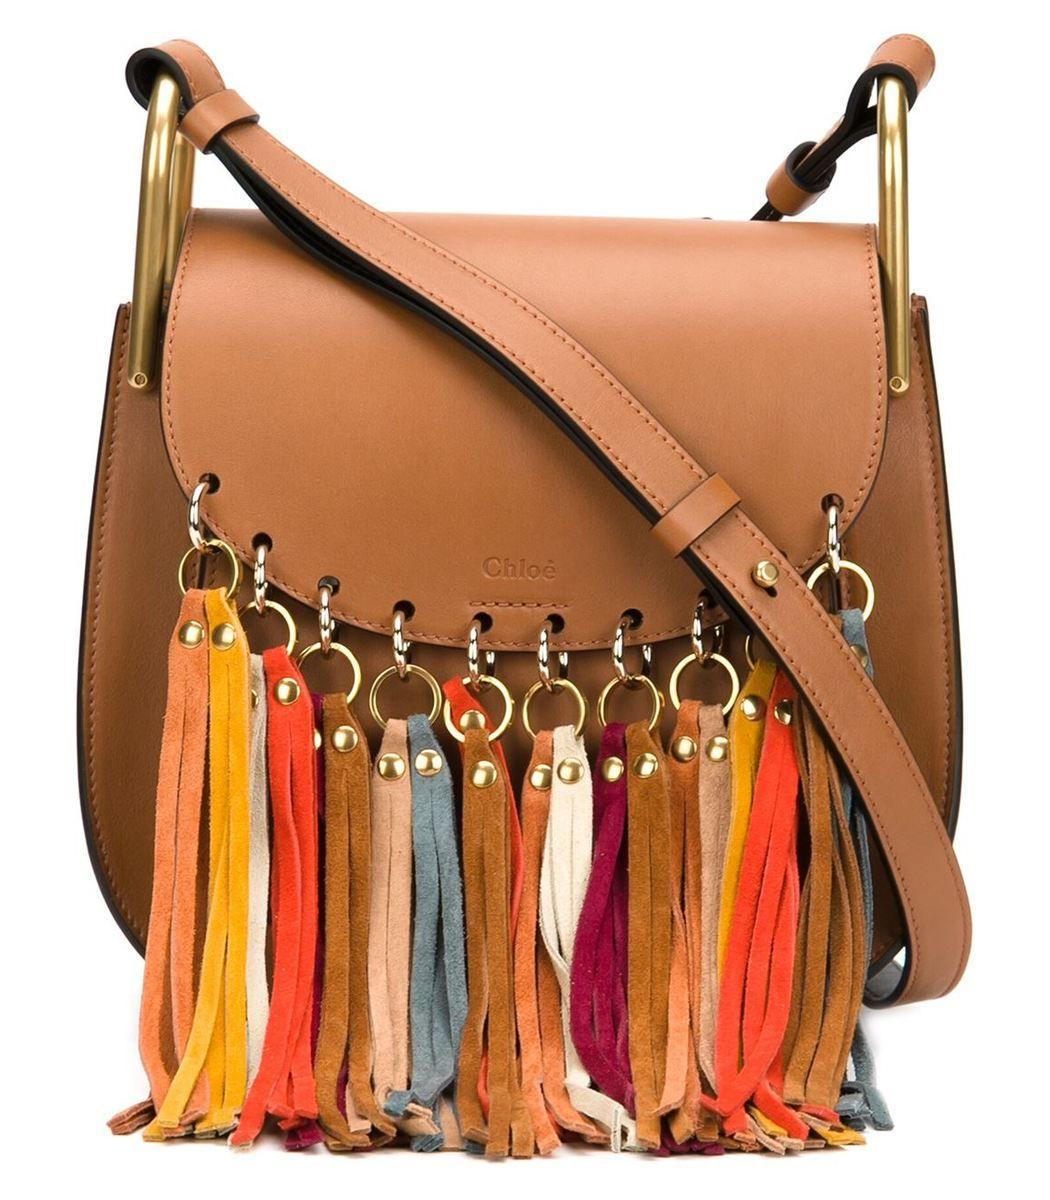 a62c2155d530d Chloe Brown 'Hudson' Tassel Bag | Bags in 2019 | Fringe bags ...